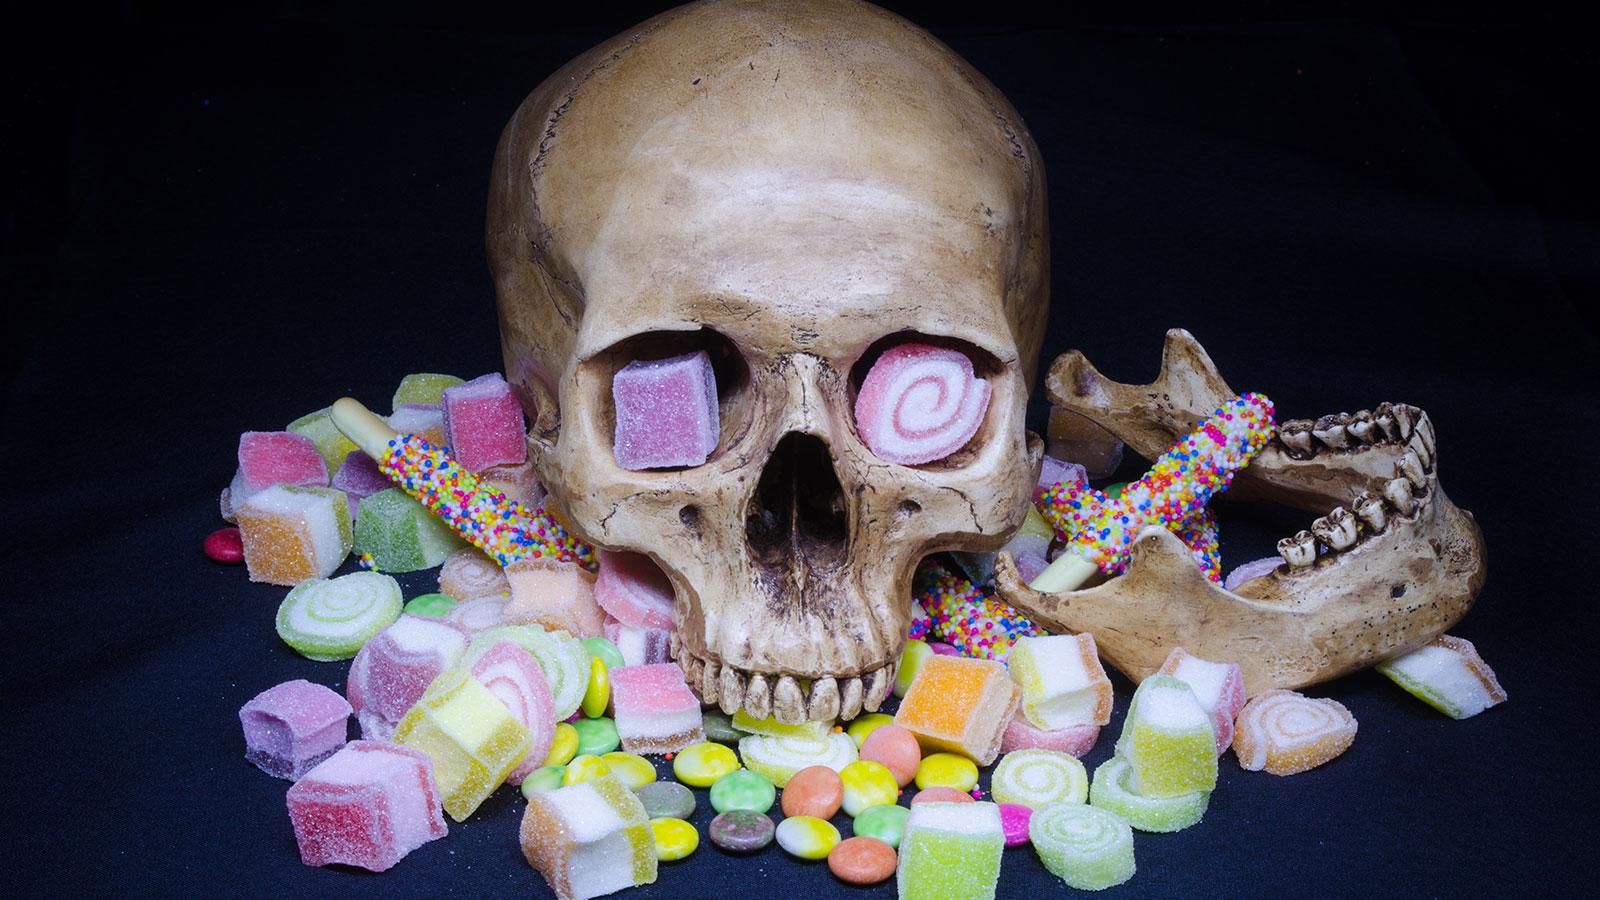 Skull & candy